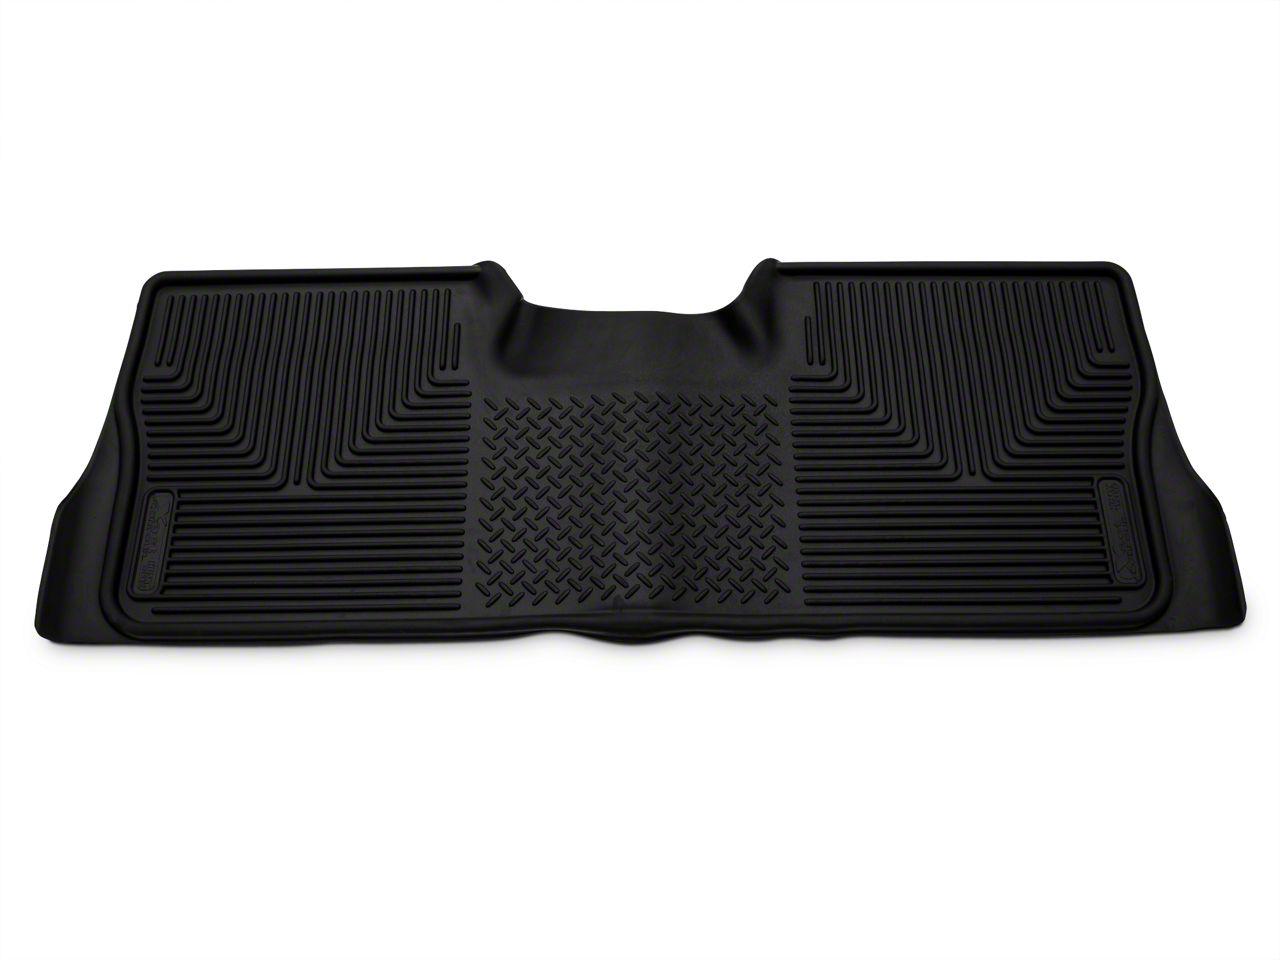 Husky X-Act Contour 2nd Seat Floor Liner - Black (09-14 F-150 SuperCrew)